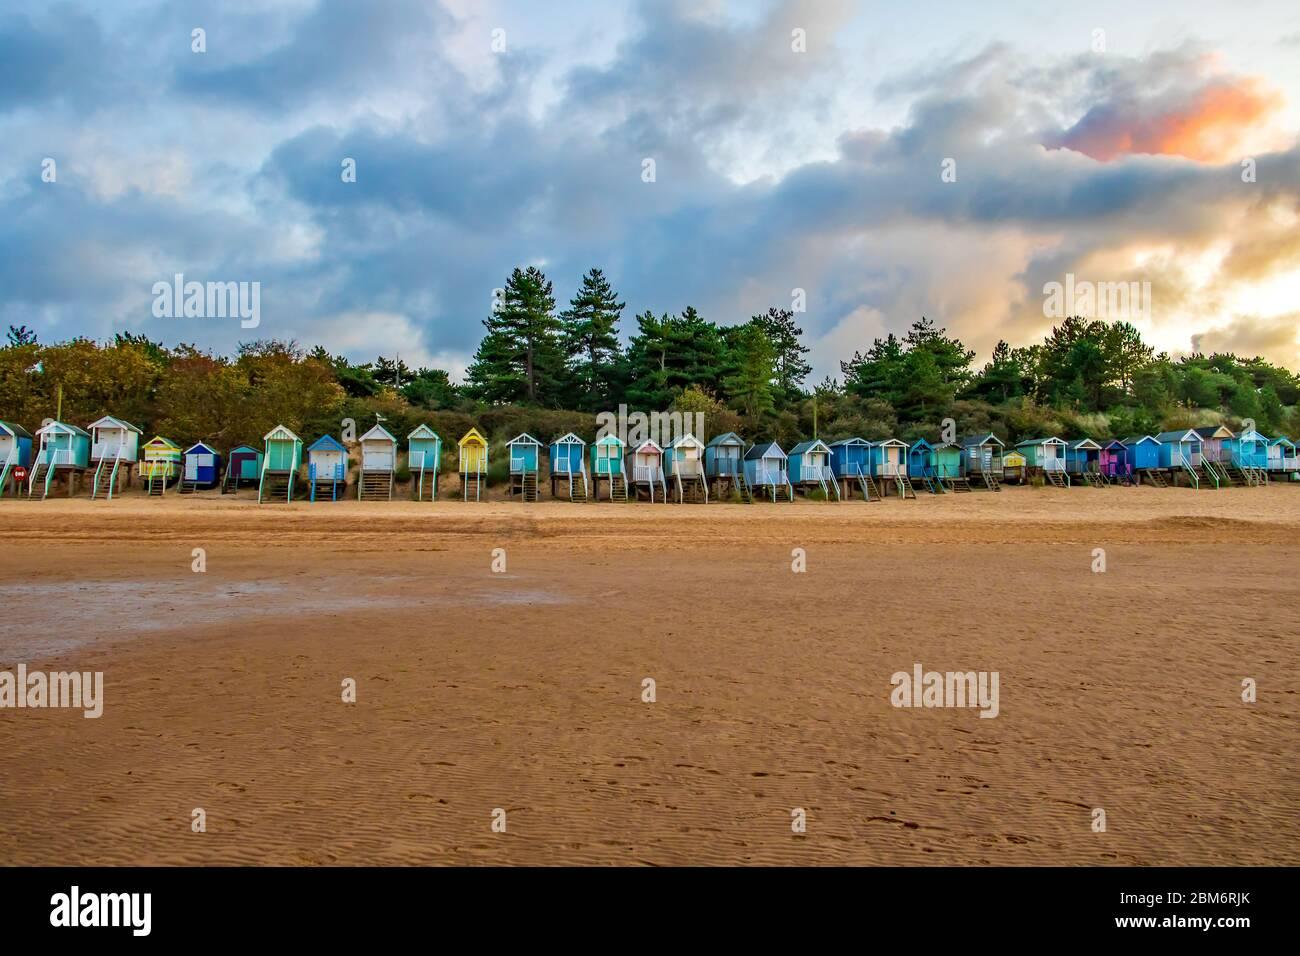 Beach huts at Wells-next-the-Sea, Norfolk, UK, taken at sunset Stock Photo